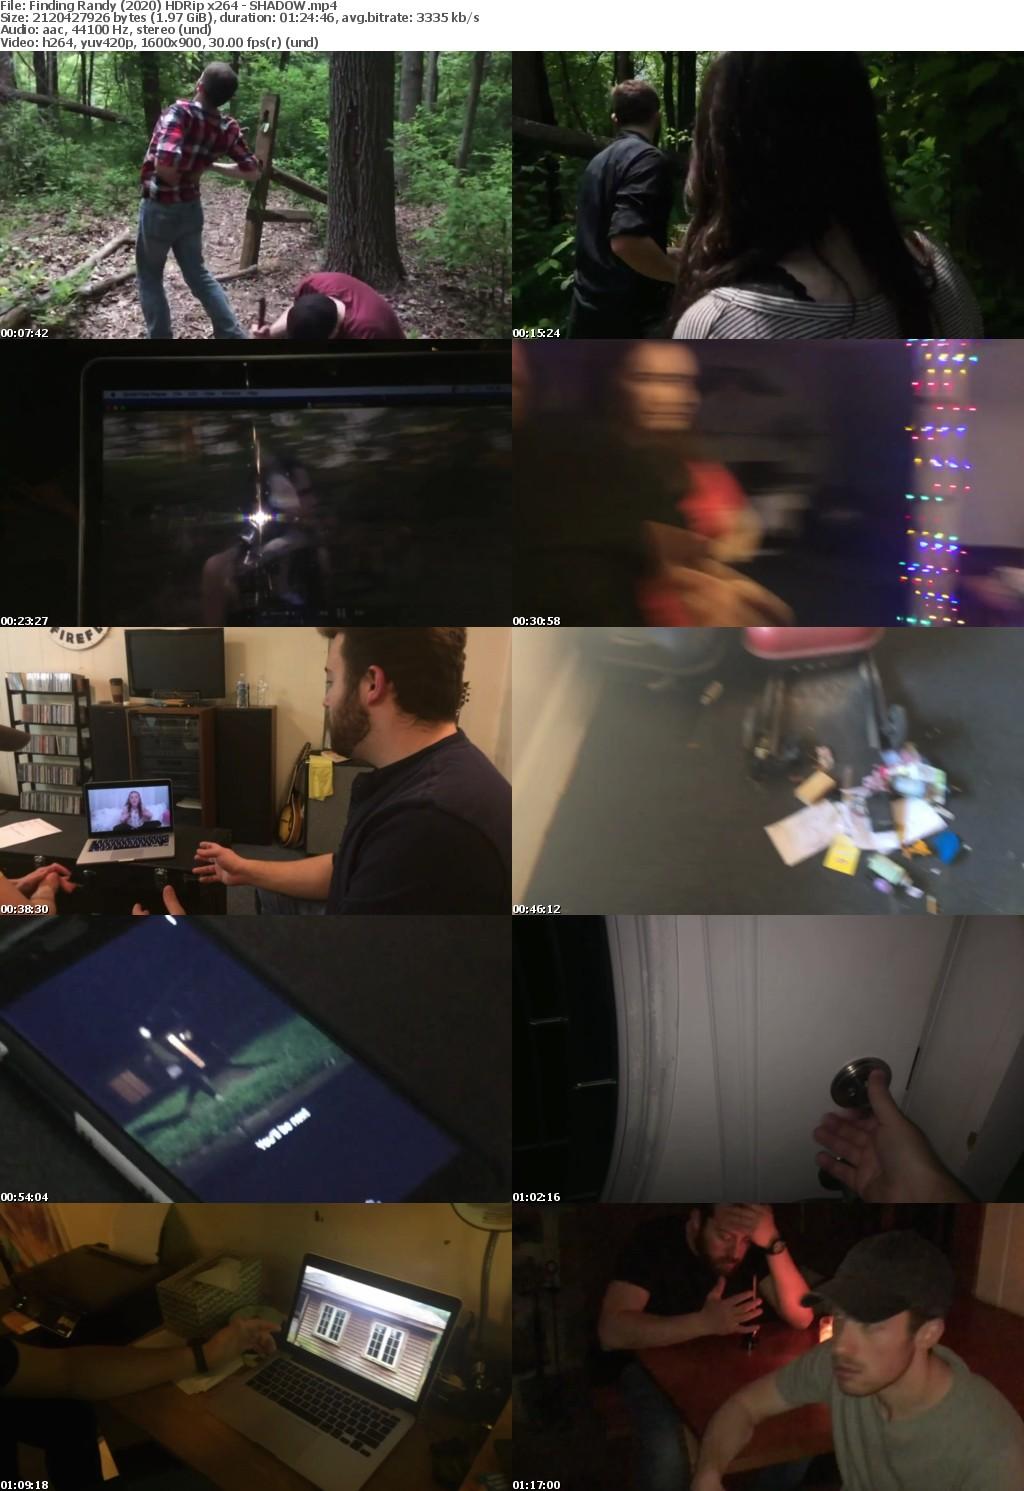 Finding Randy (2020) HDRip x264 - SHADOW